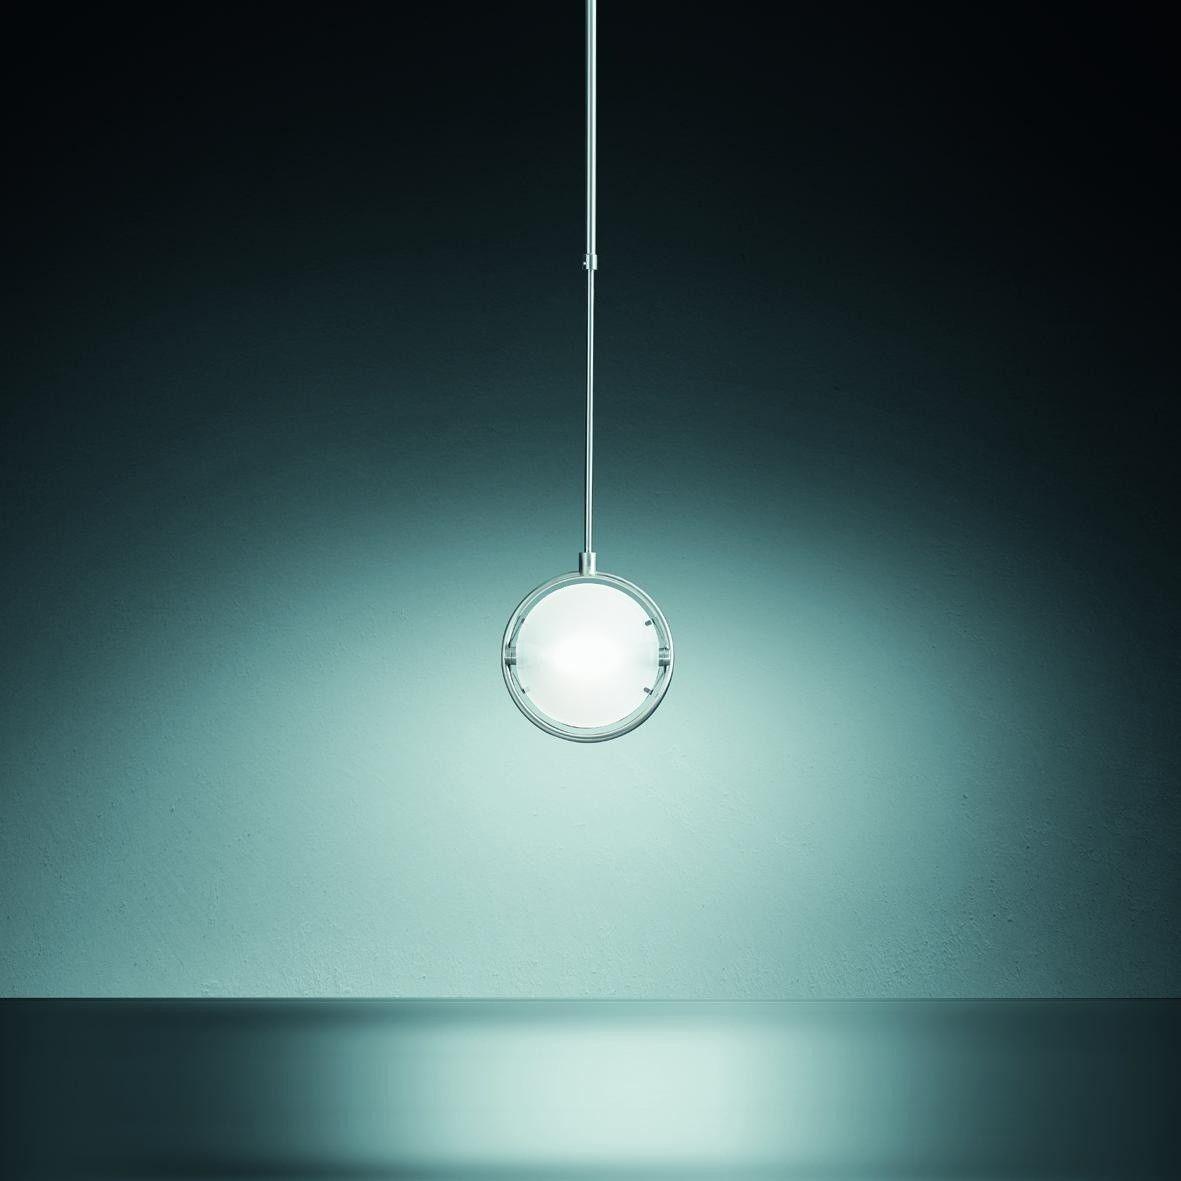 nobi suspension lamp fontana arte. Black Bedroom Furniture Sets. Home Design Ideas